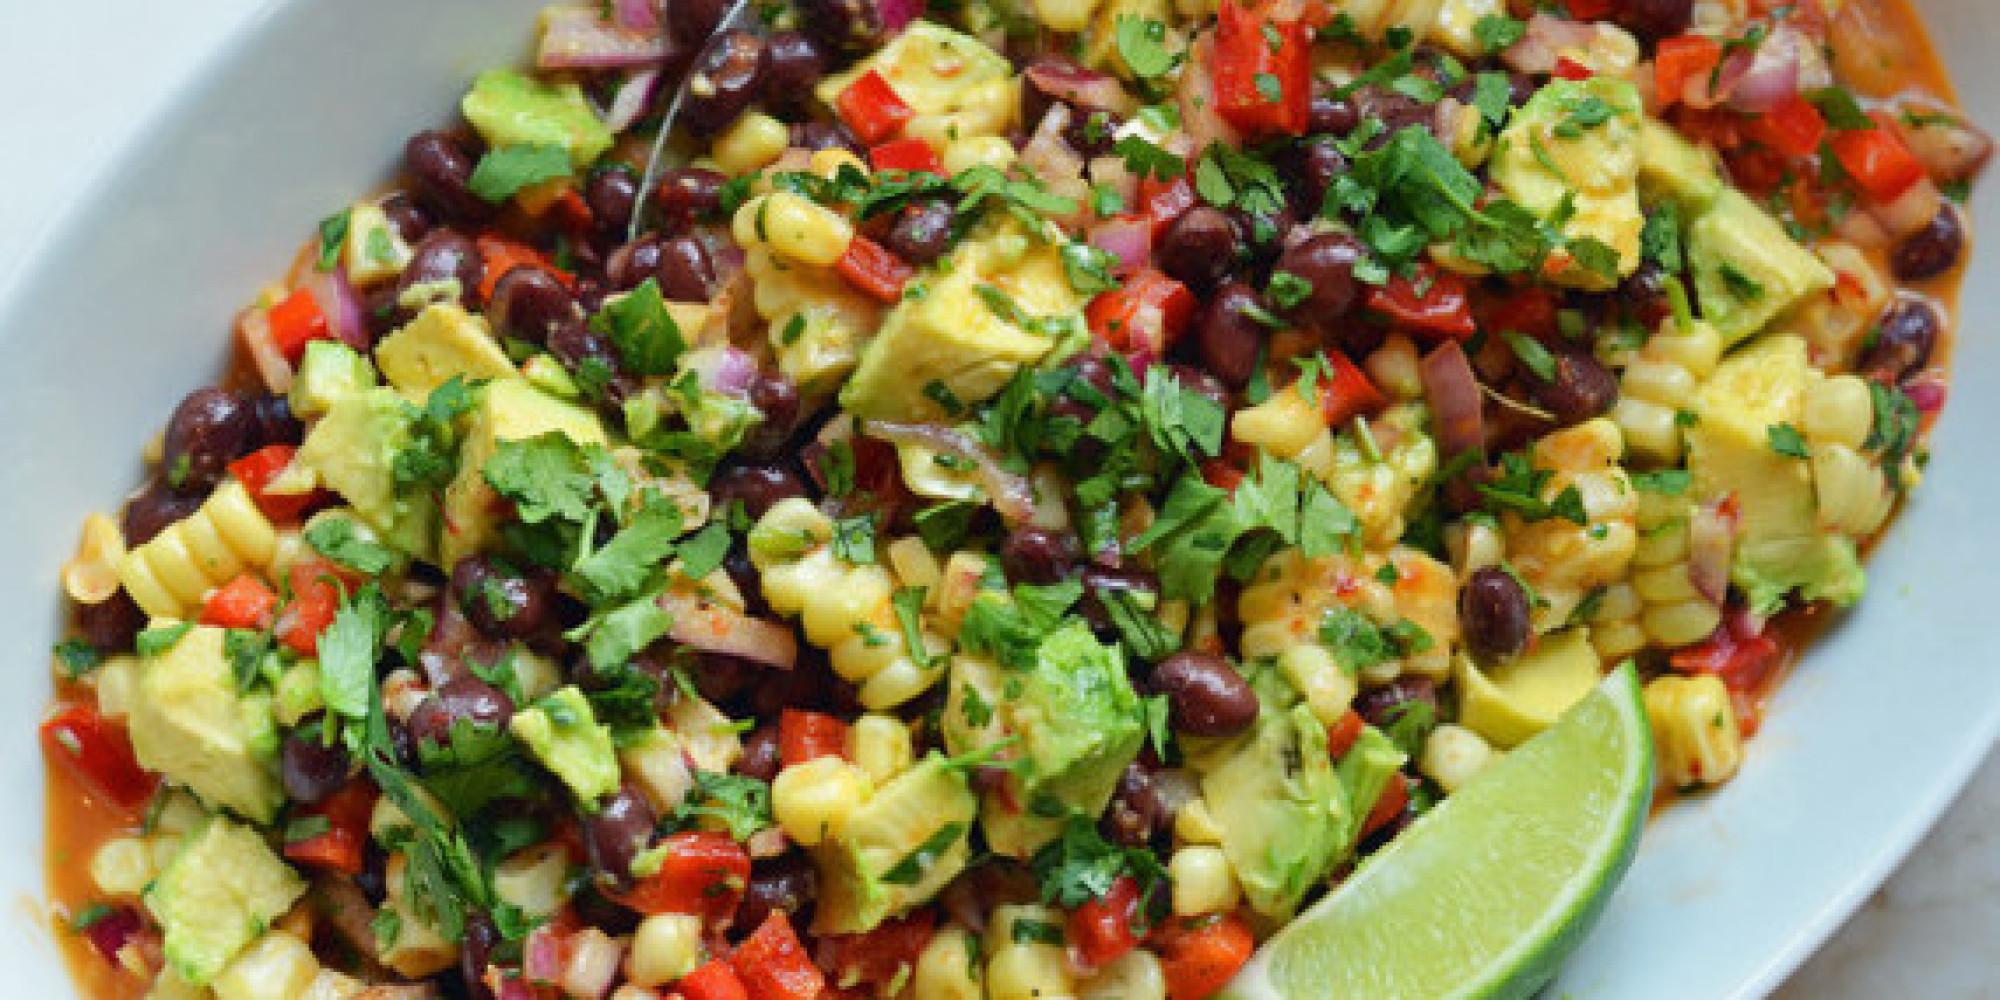 10 Lettuce-Free Salads You'll Make All Summer Long | HuffPost